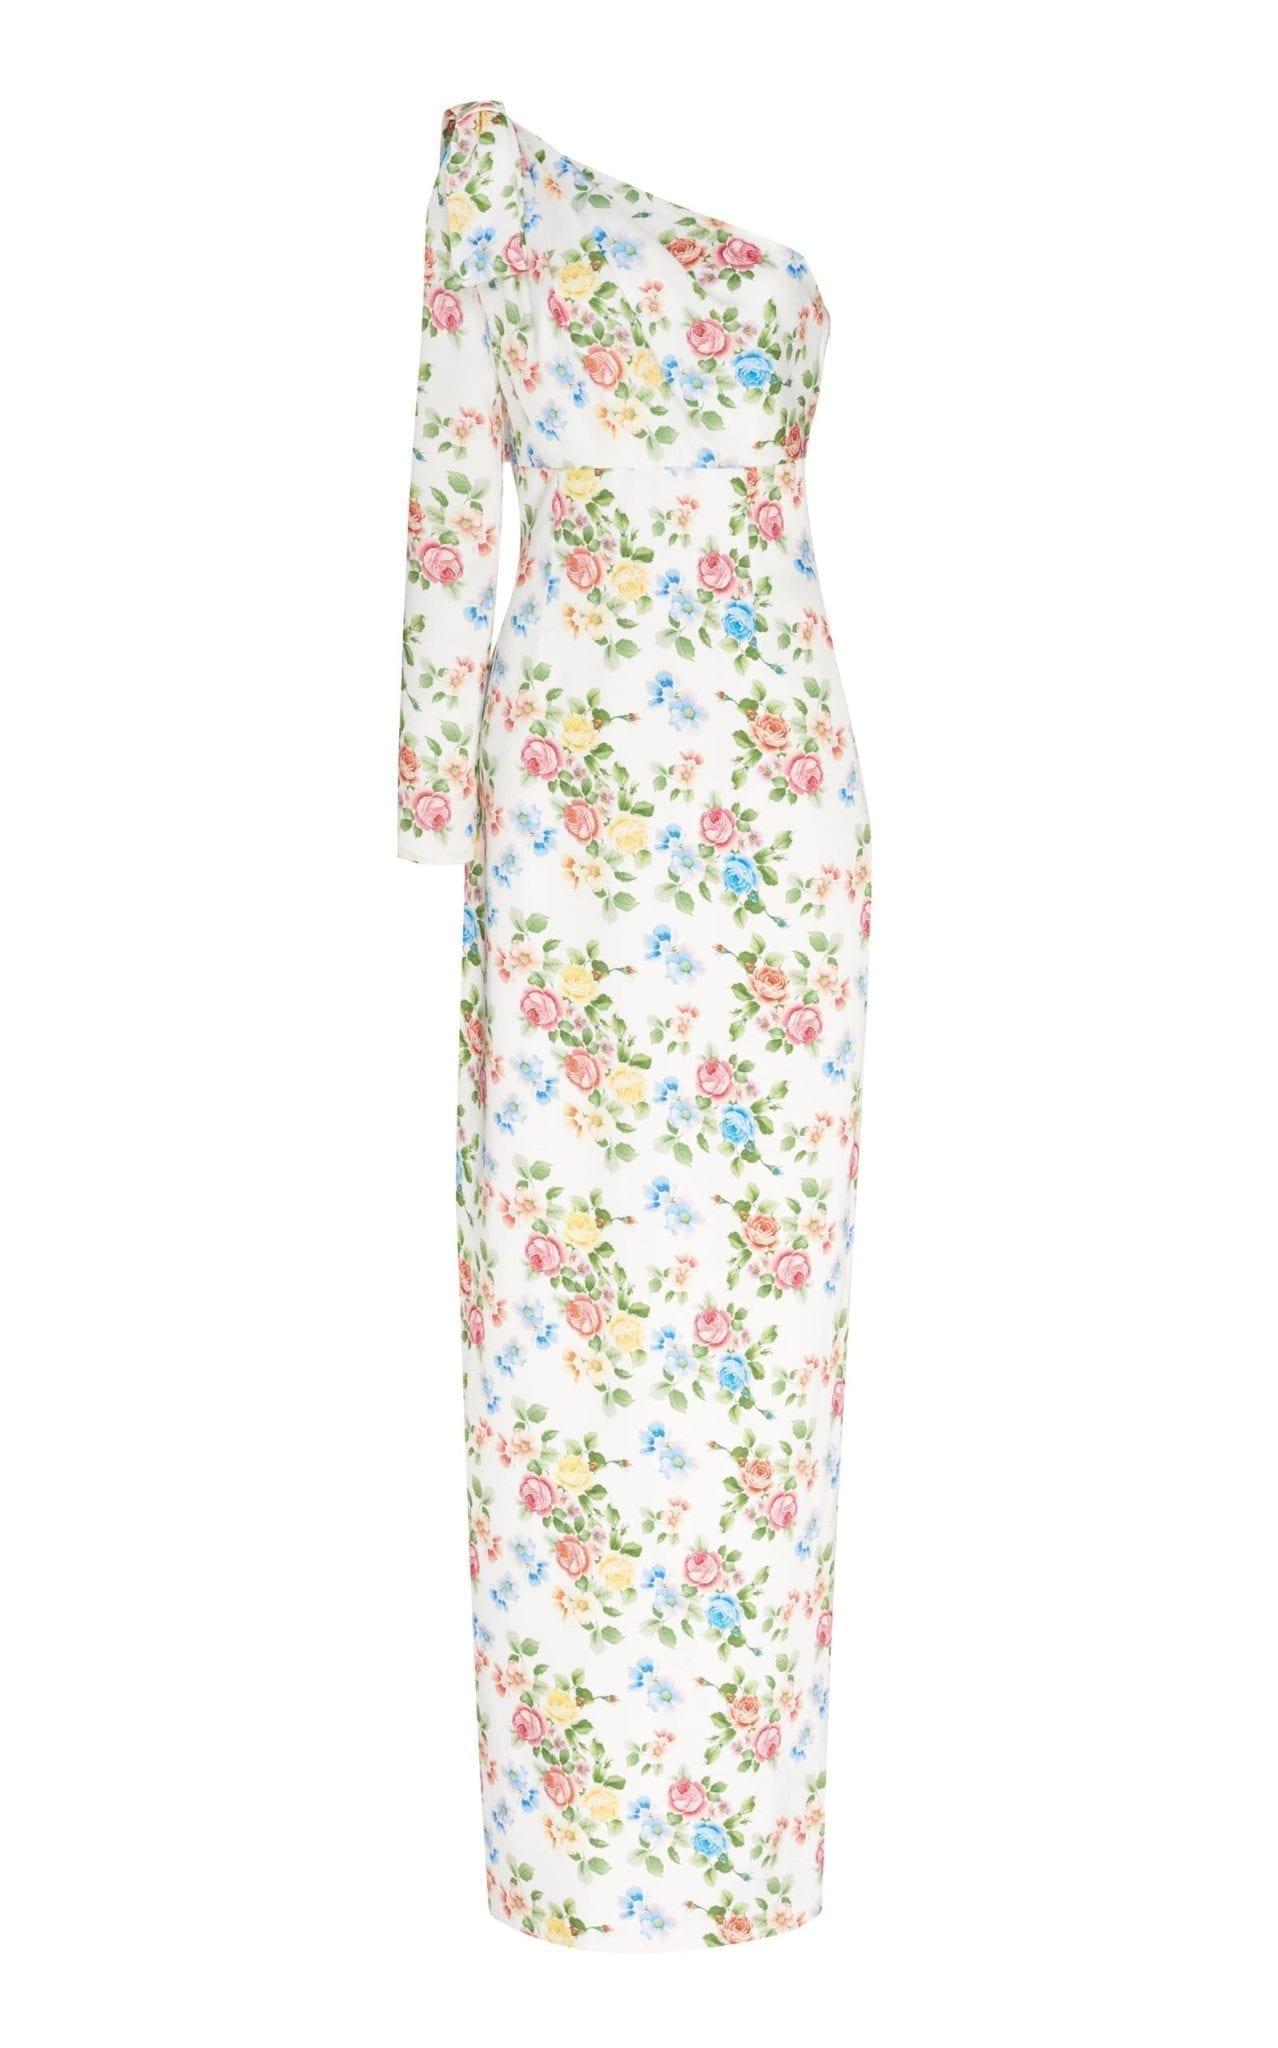 EMILIA WICKSTEAD Nadia Draped One-Shoulder Floral Dress